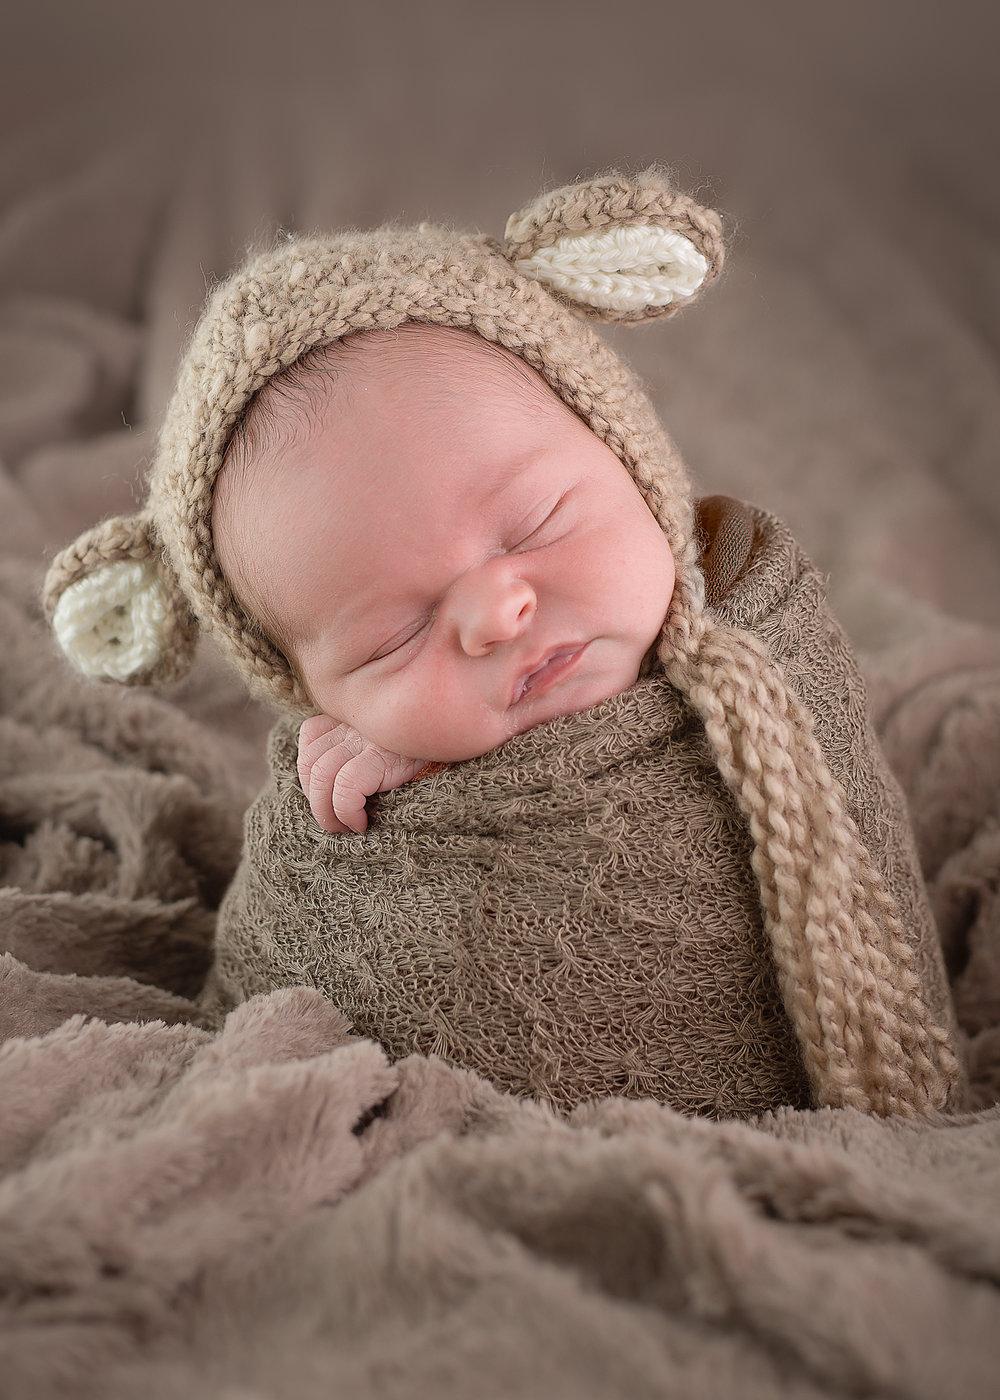 Newborn97NaomiLuciennePhotography052018-3-Edit.jpg